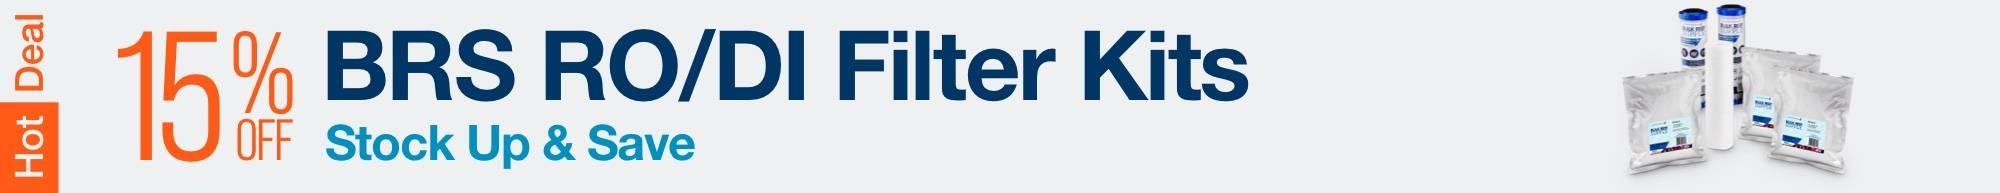 Filter Kit Sale - Save 15% on BRS filter kits